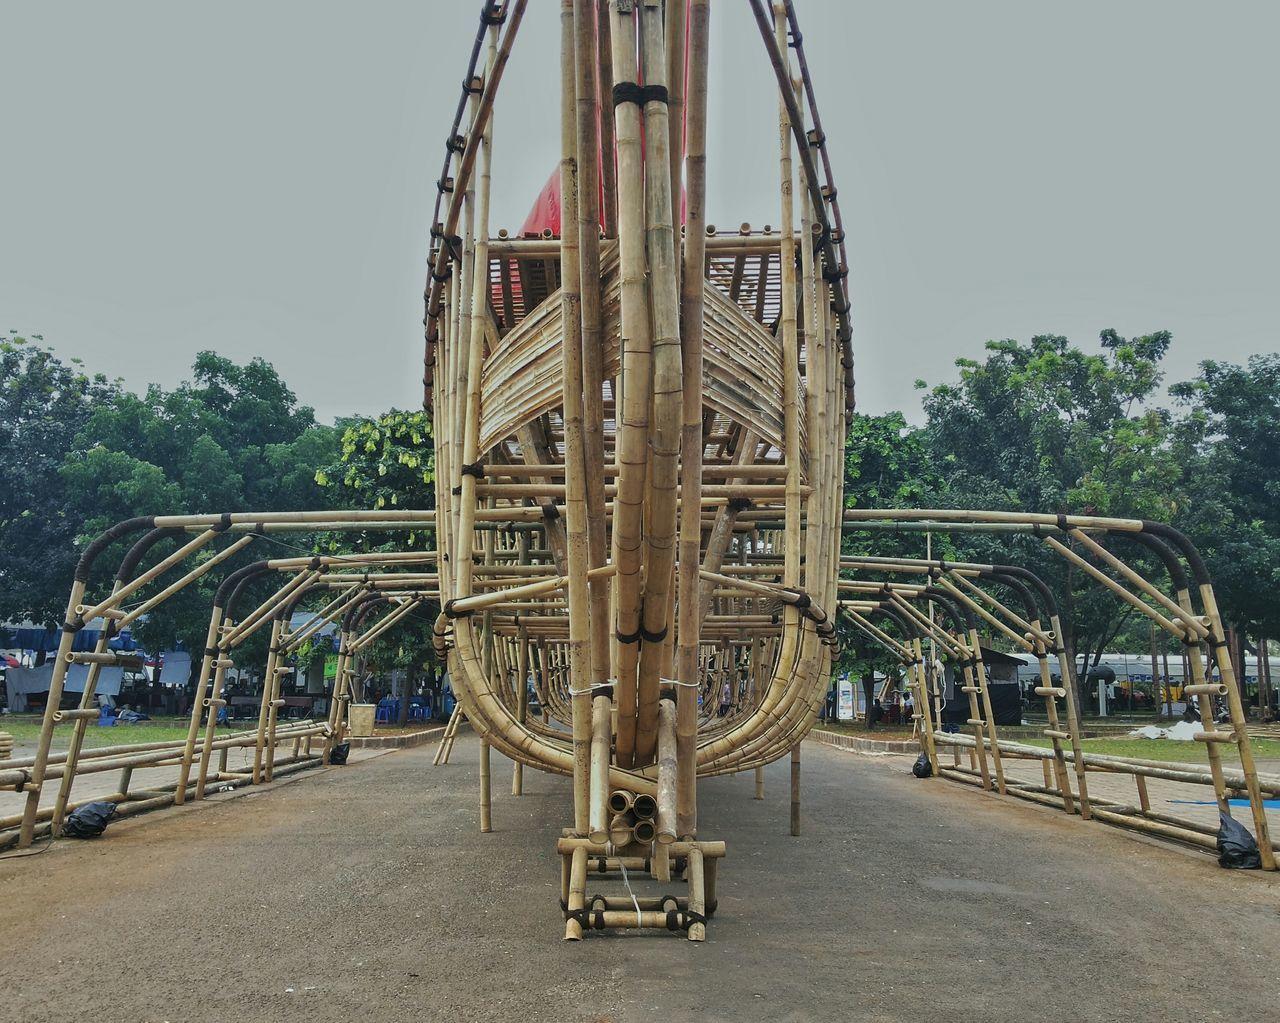 Throw A Curve Indonesia_photography EyeEm Indonesia Buildings Taking Photos Bamboodesign Art Artistic Noah